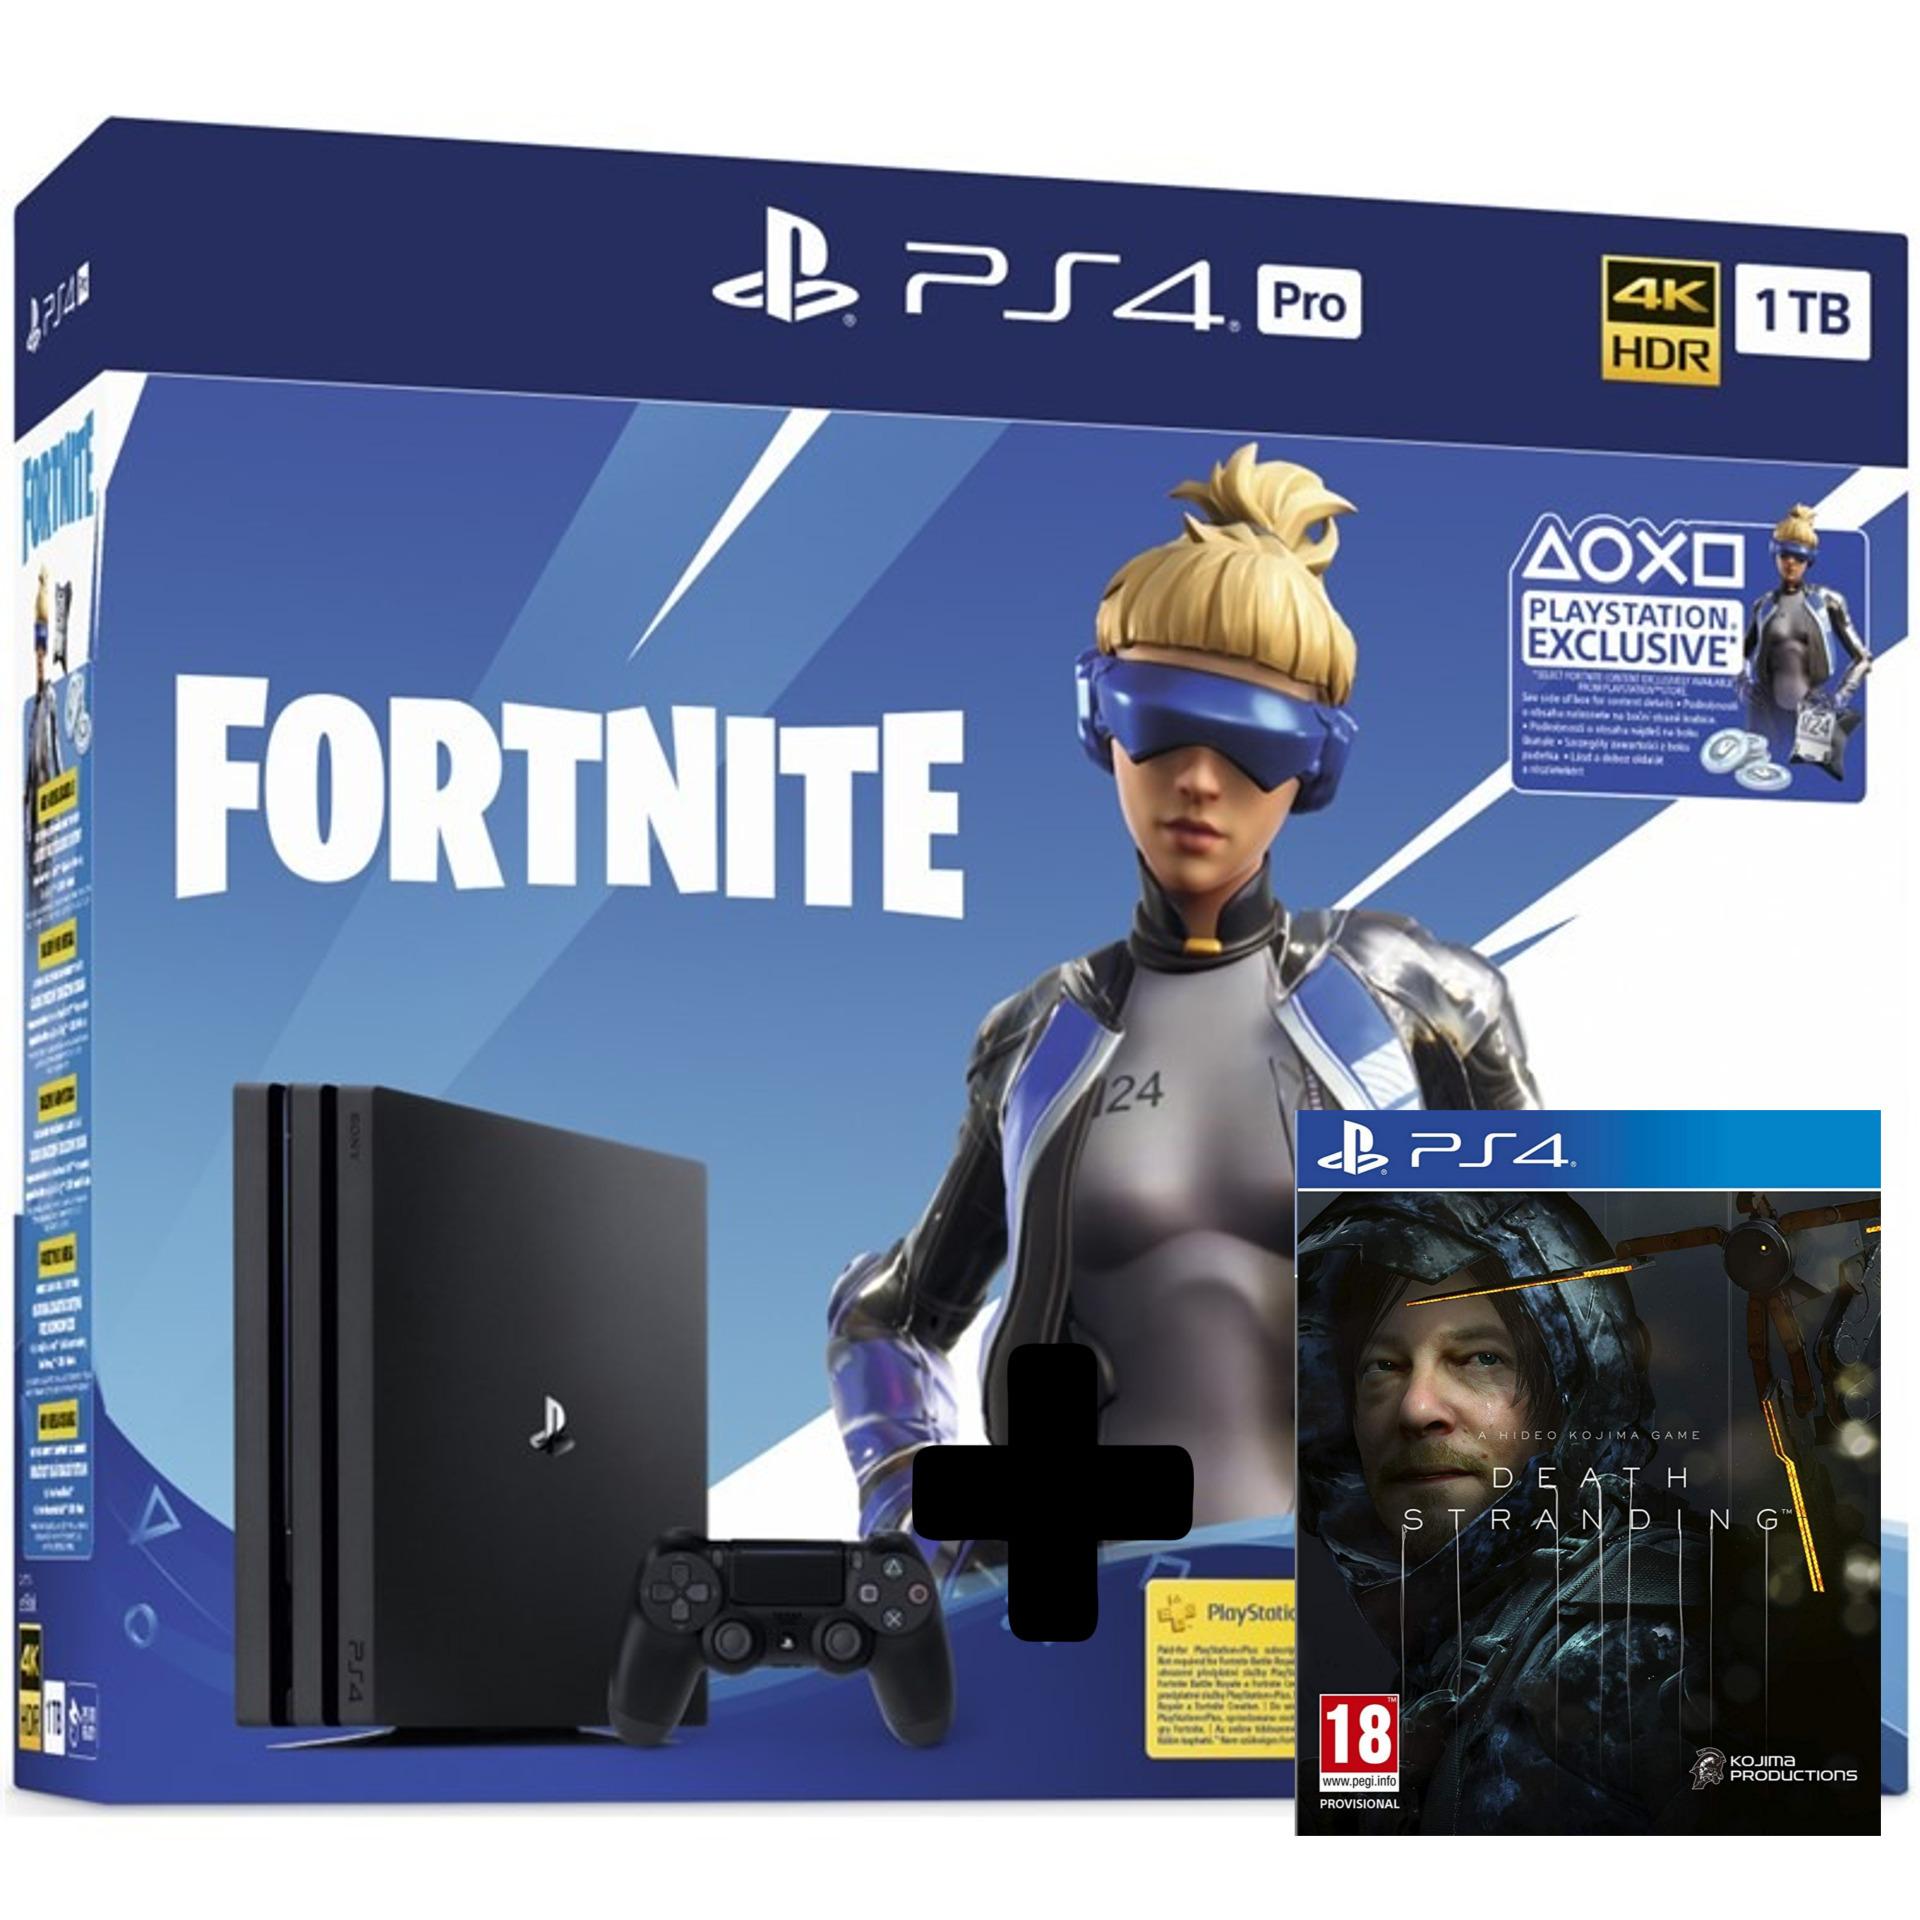 Konzola PlayStation 4 Pro 1TB + balíček Fortnite 2000 V Bucks + Death Stranding (PS4)